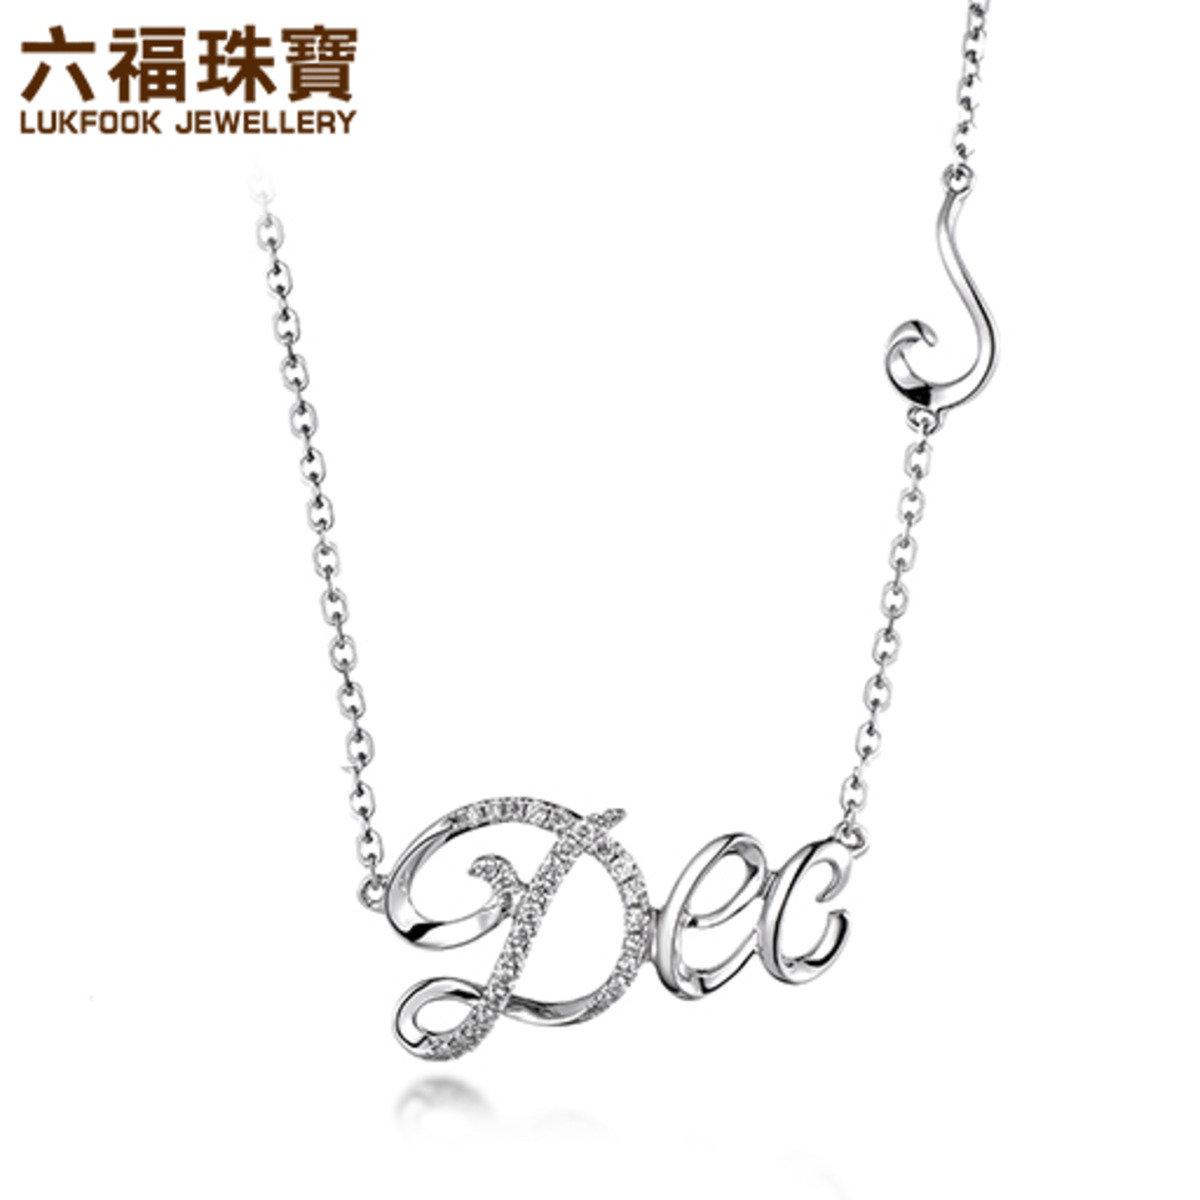 18K/750金(白色)鑲鑽石頸鏈